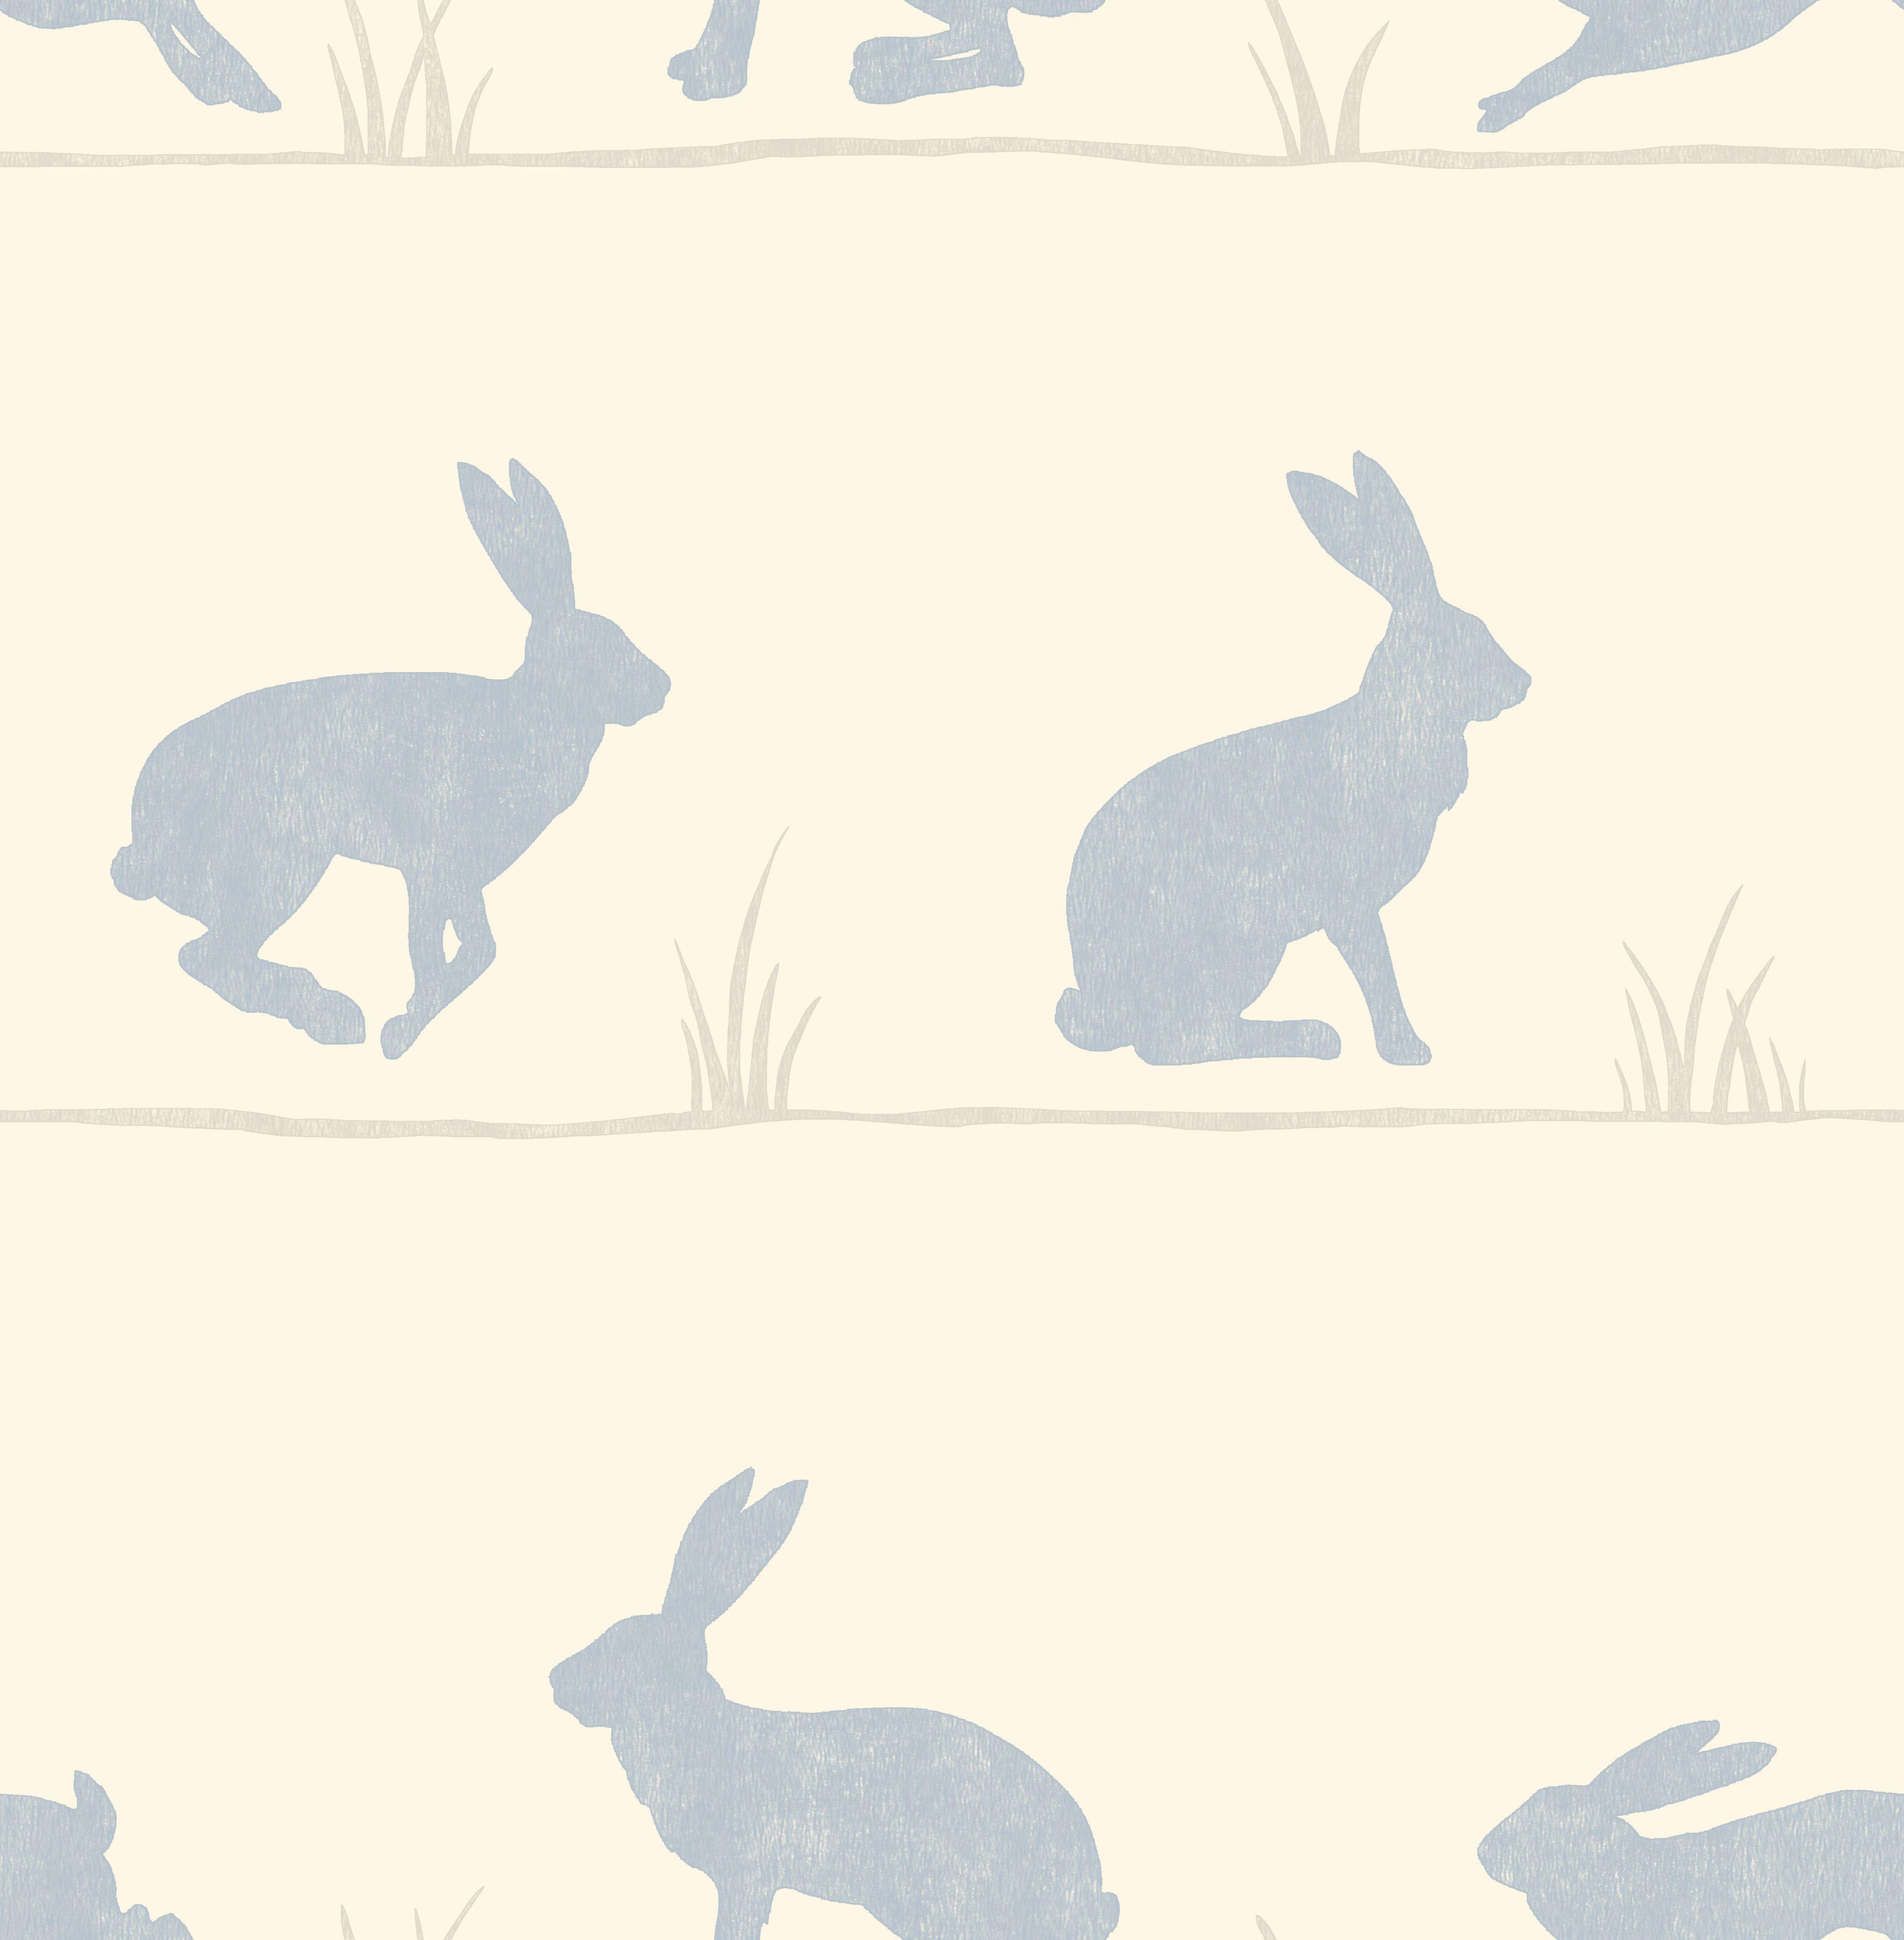 Nell Nordic Blue Rabbit Wallpaper Departments DIY at BQ 3925x4000